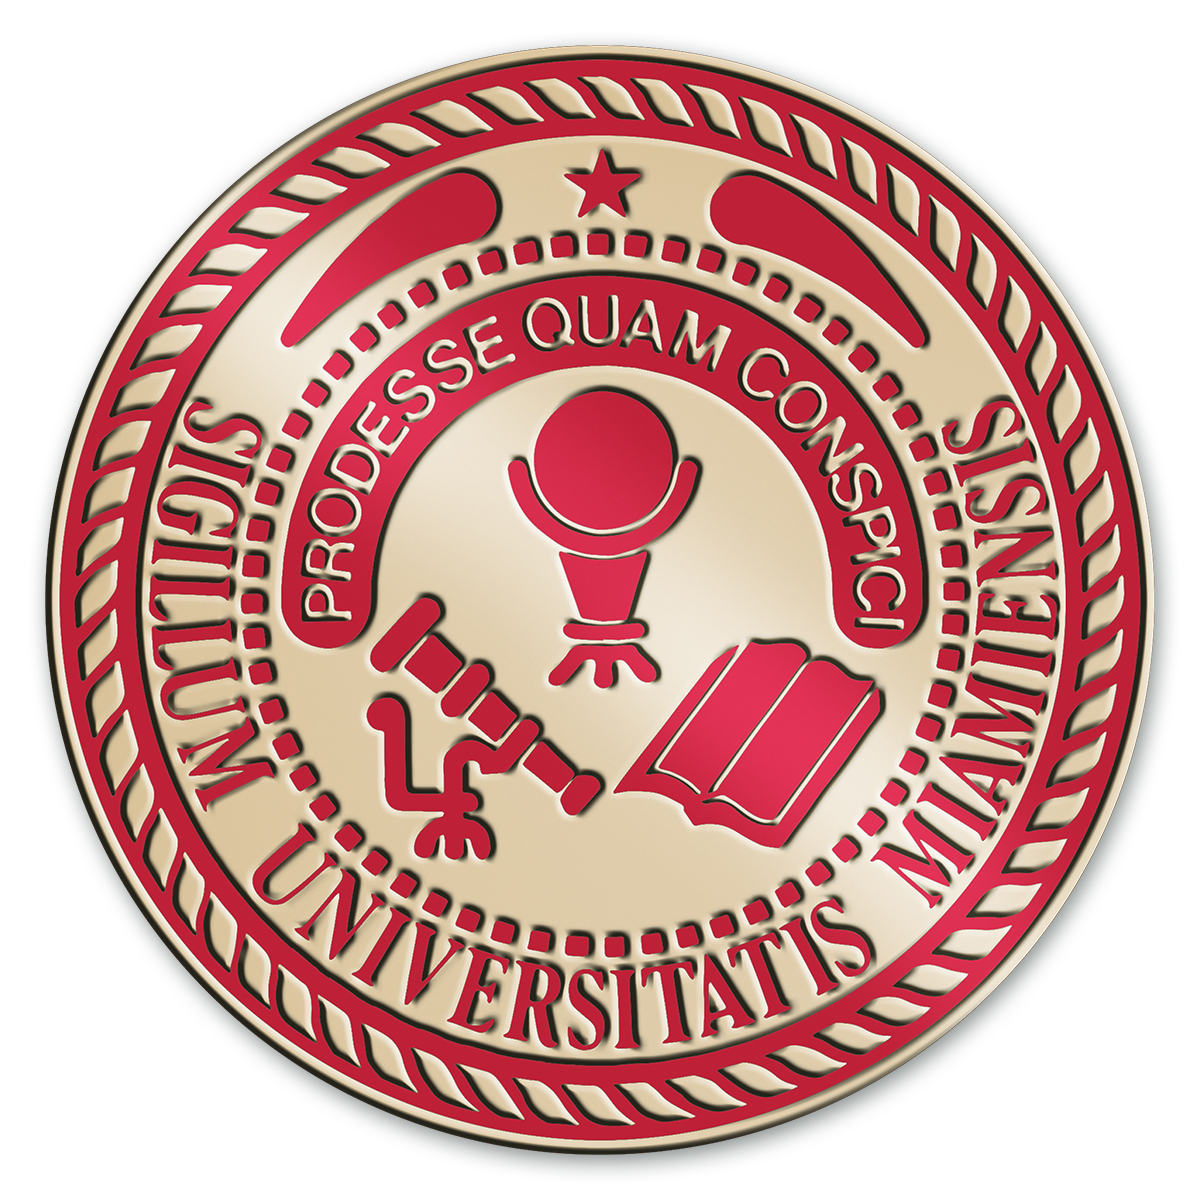 Miami University In Ohio Diploma Frame Excelsior